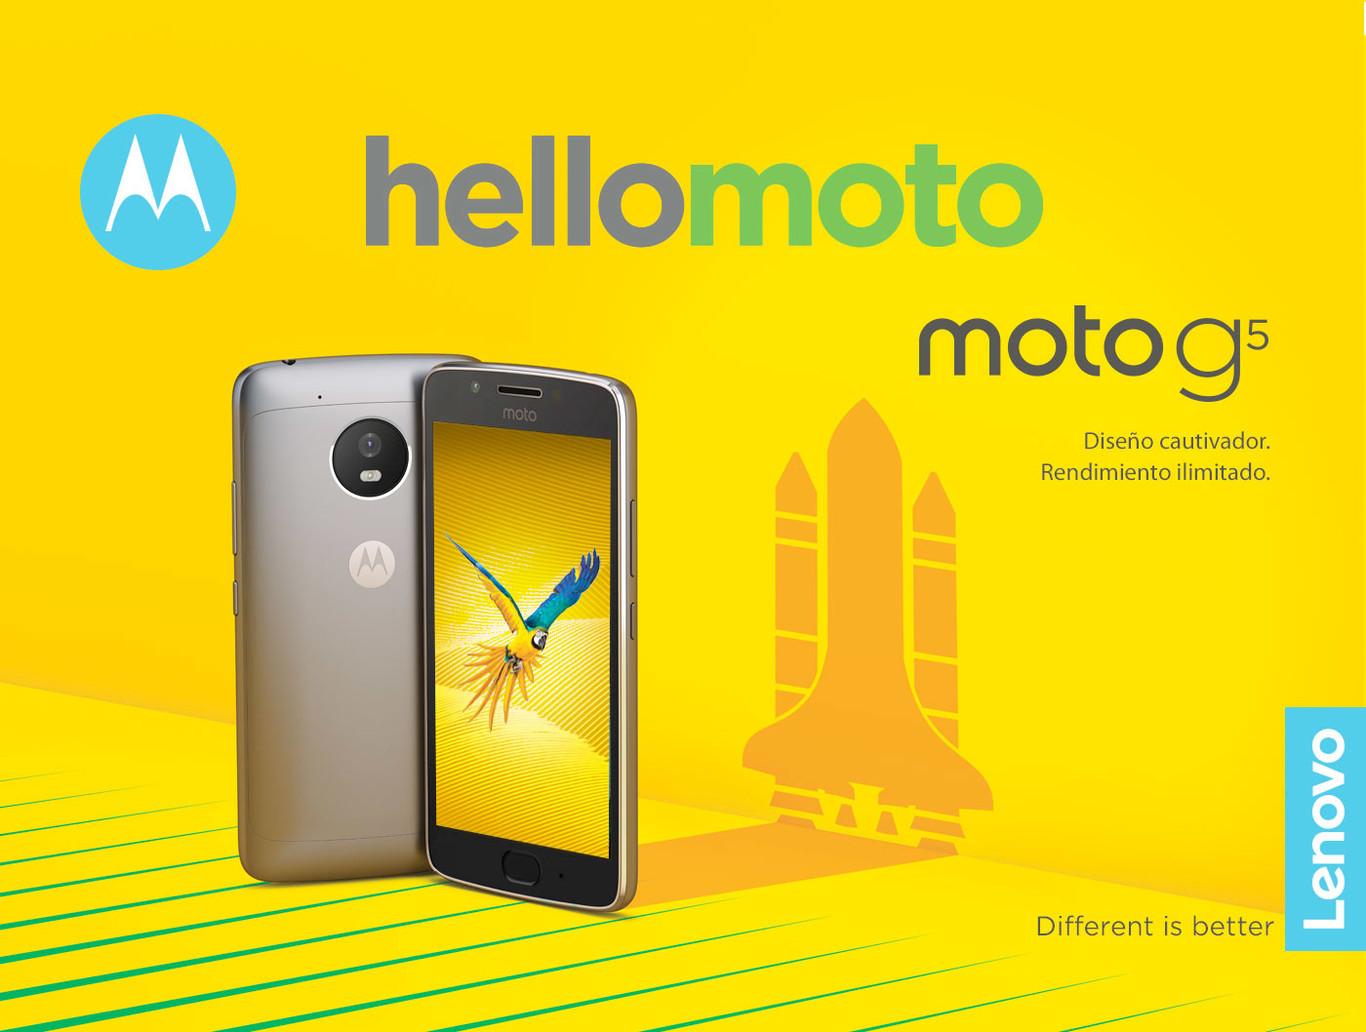 Moto G5 IMAGENES OFICIALES